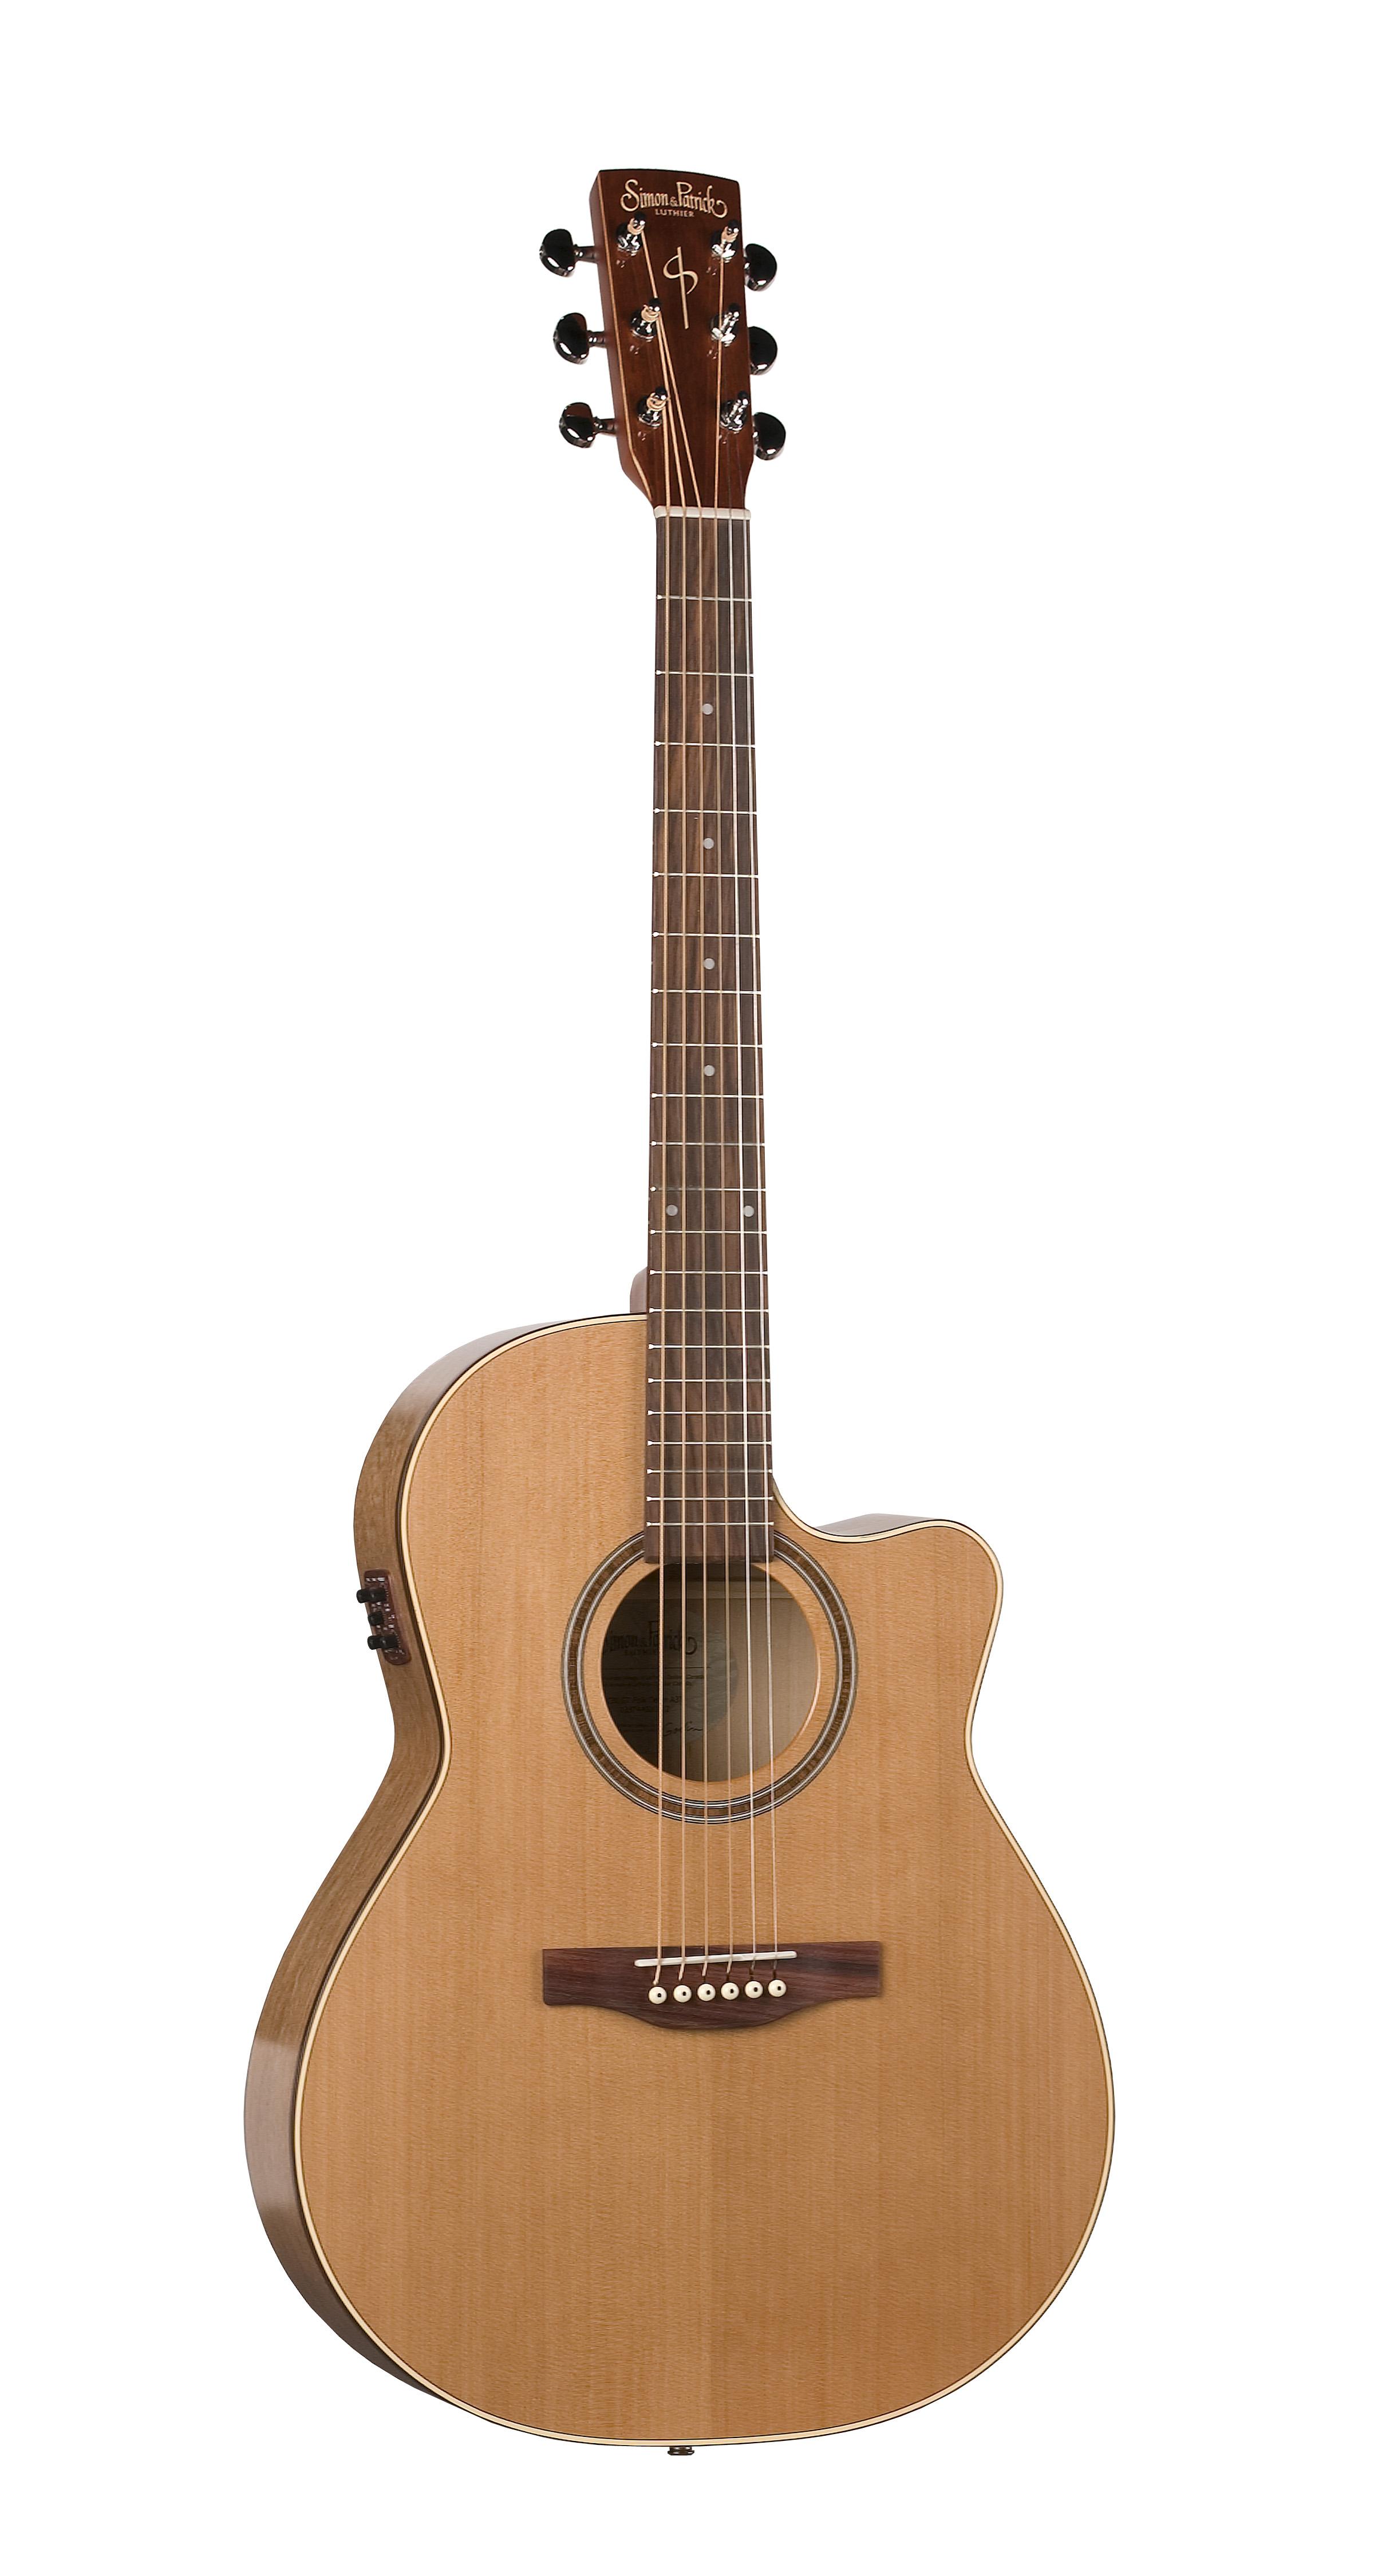 Simon & Patrick 33744 Cedar Gloss Top (GT) Cutaway Folk Acoustic Electric Guitar w/ B-band A3T